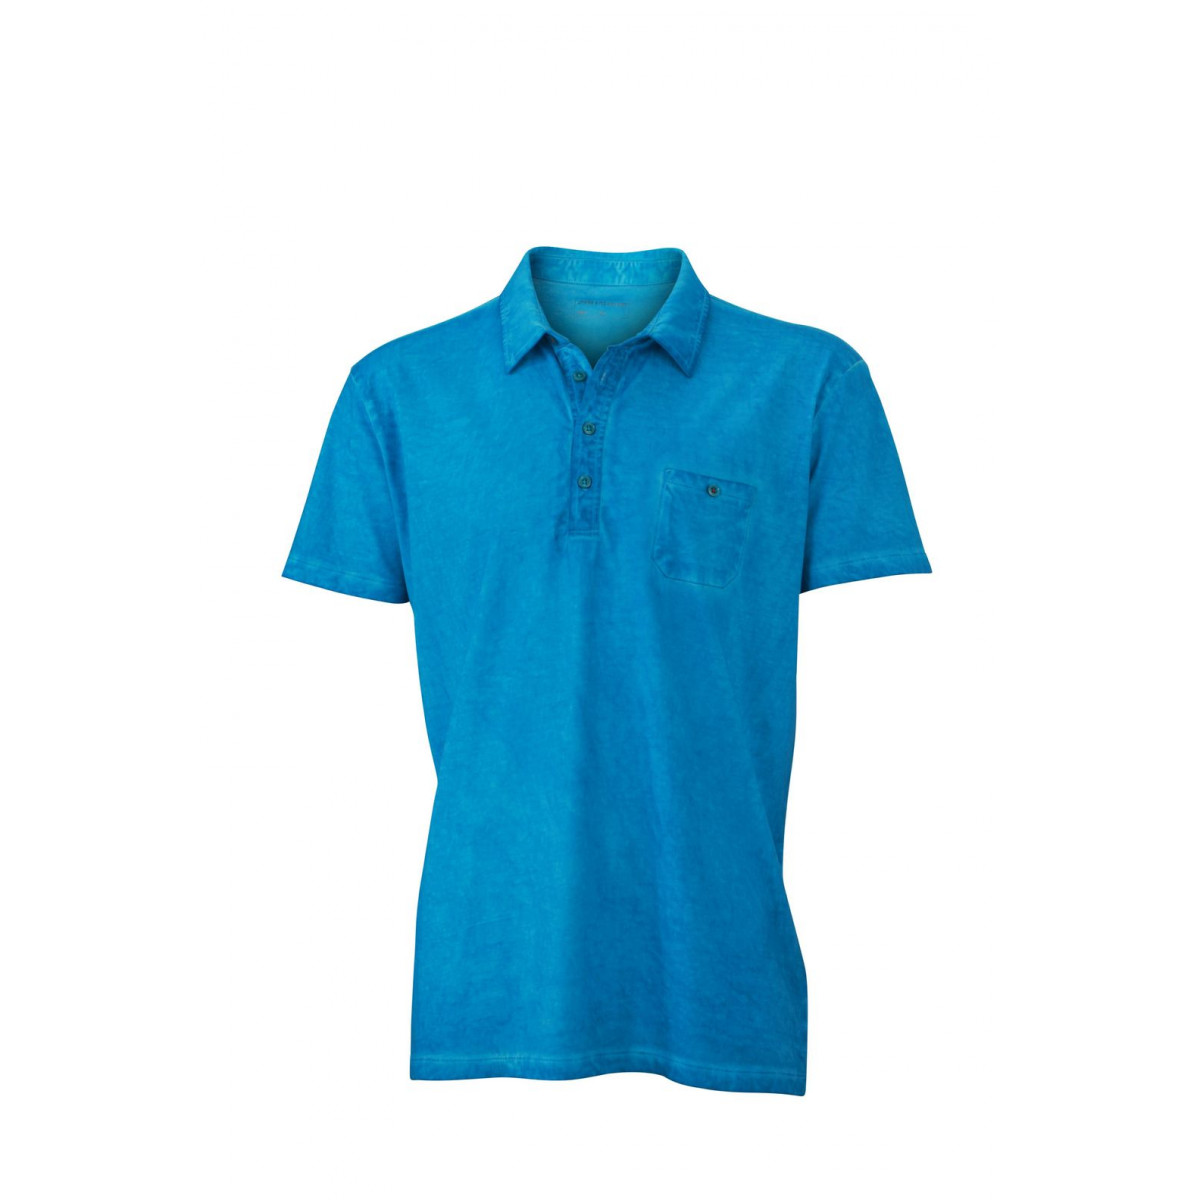 Рубашка поло мужская JN988 Mens Gipsy Polo - Бирюзовый